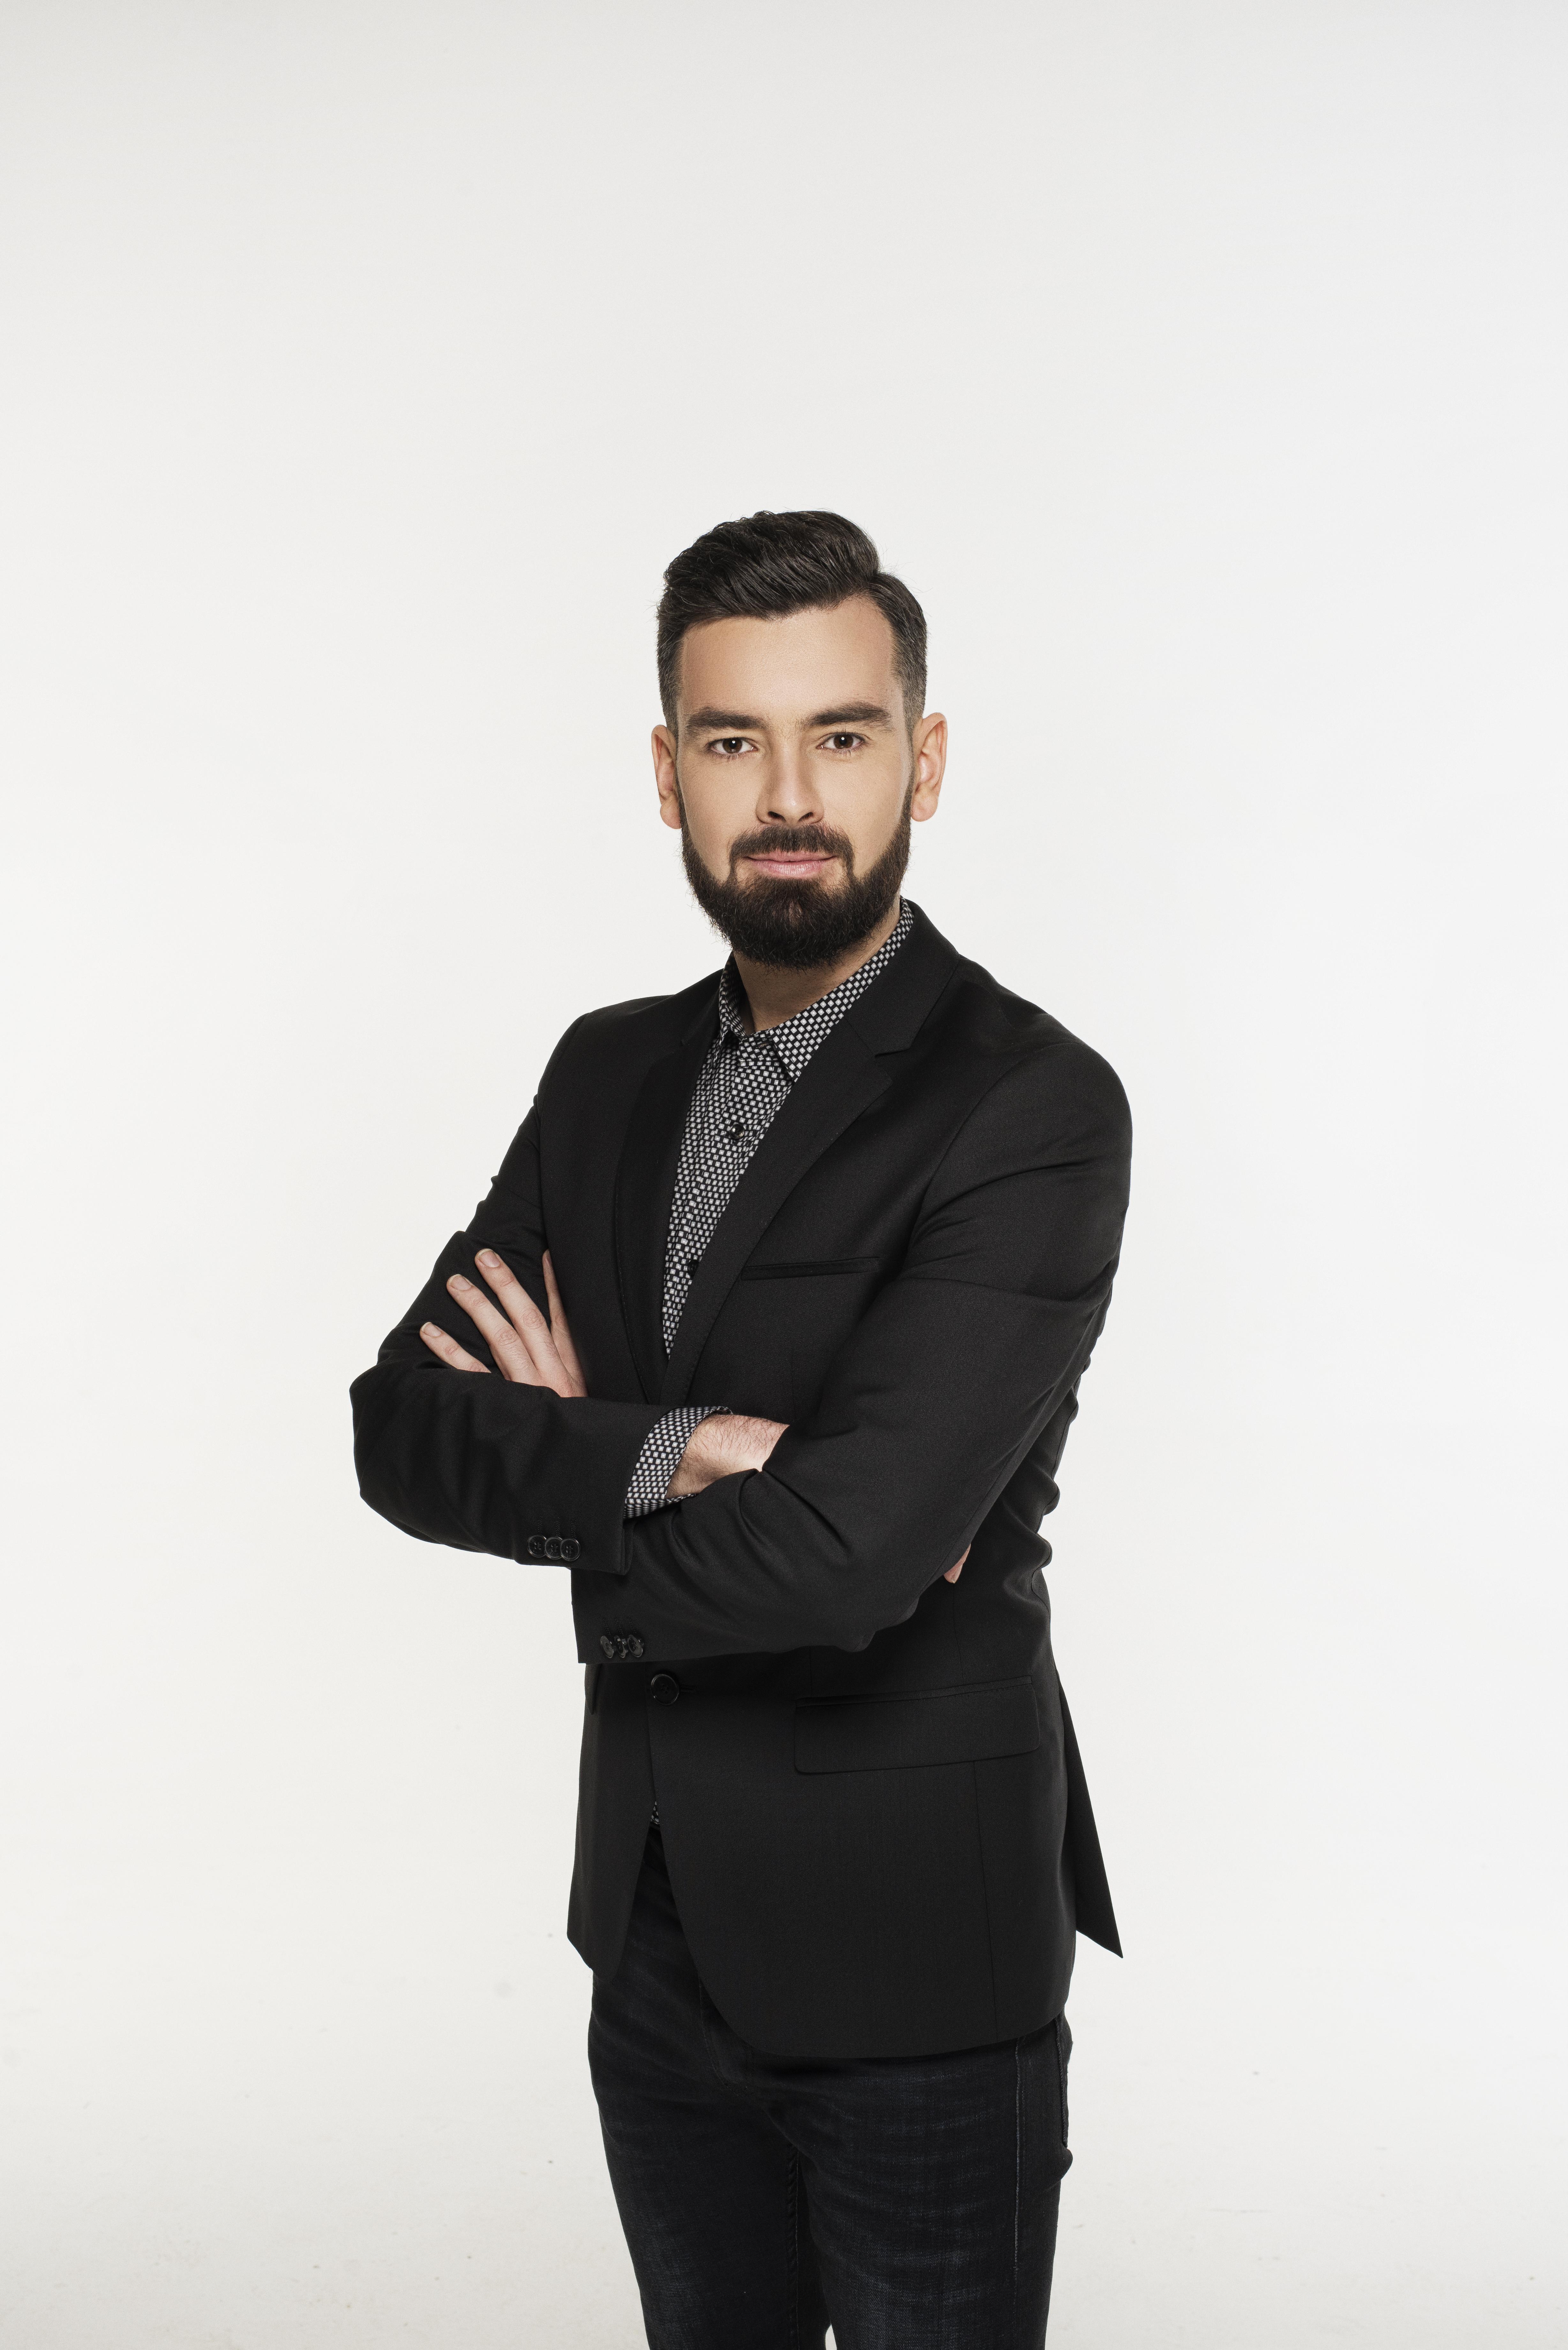 Ivica Petrović